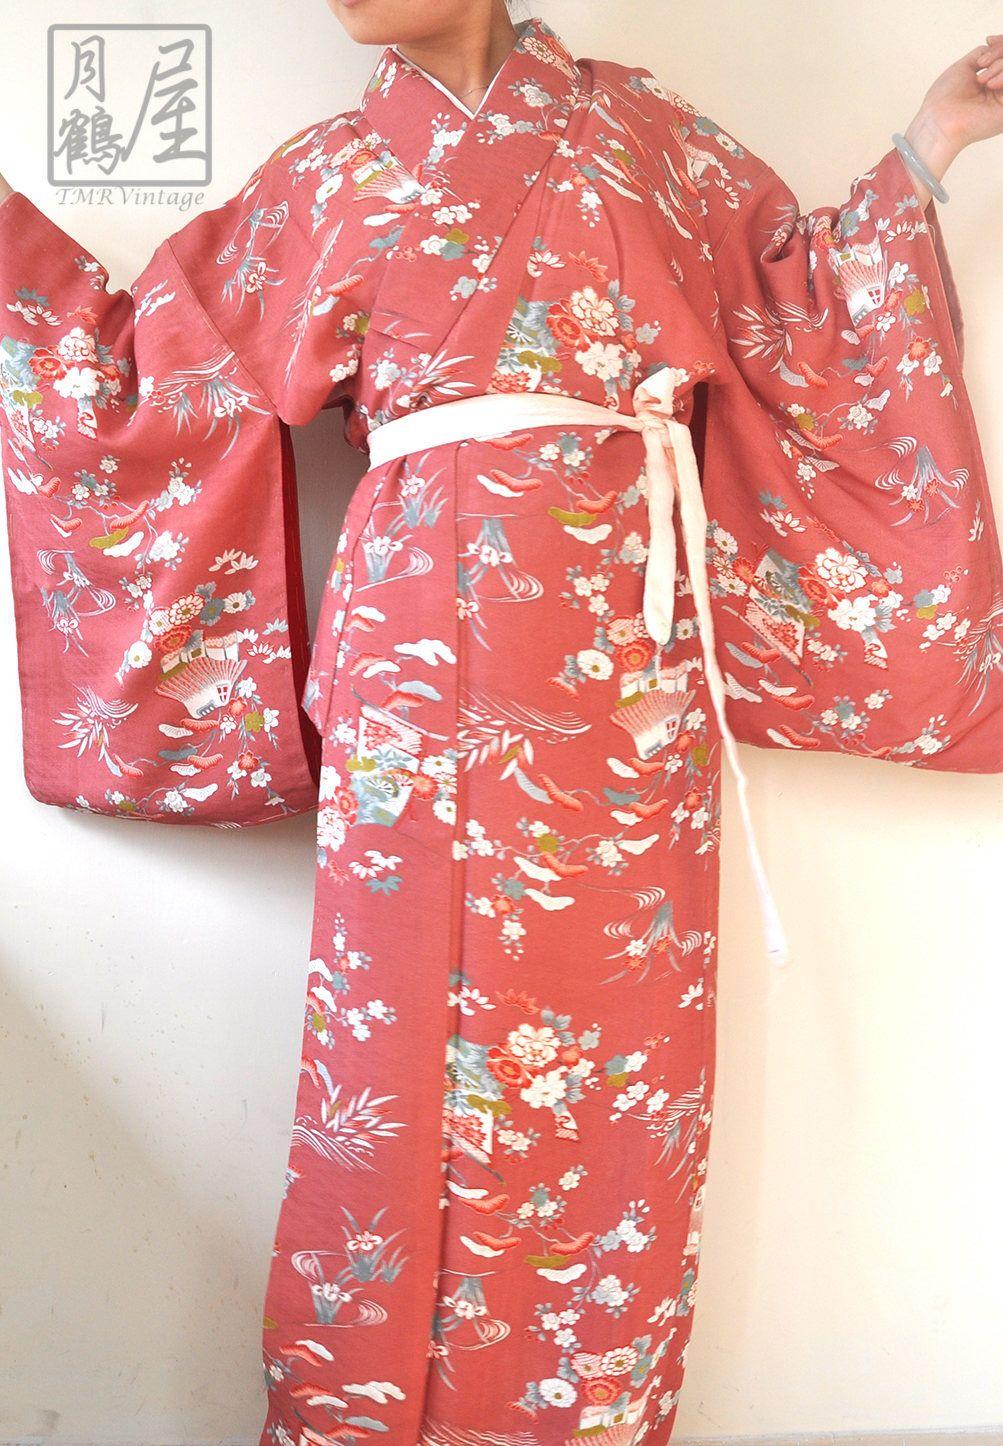 b0f8cc270 Women's silk long kimono robe/japanese vintage maxi kimono gown dress/full  length komon